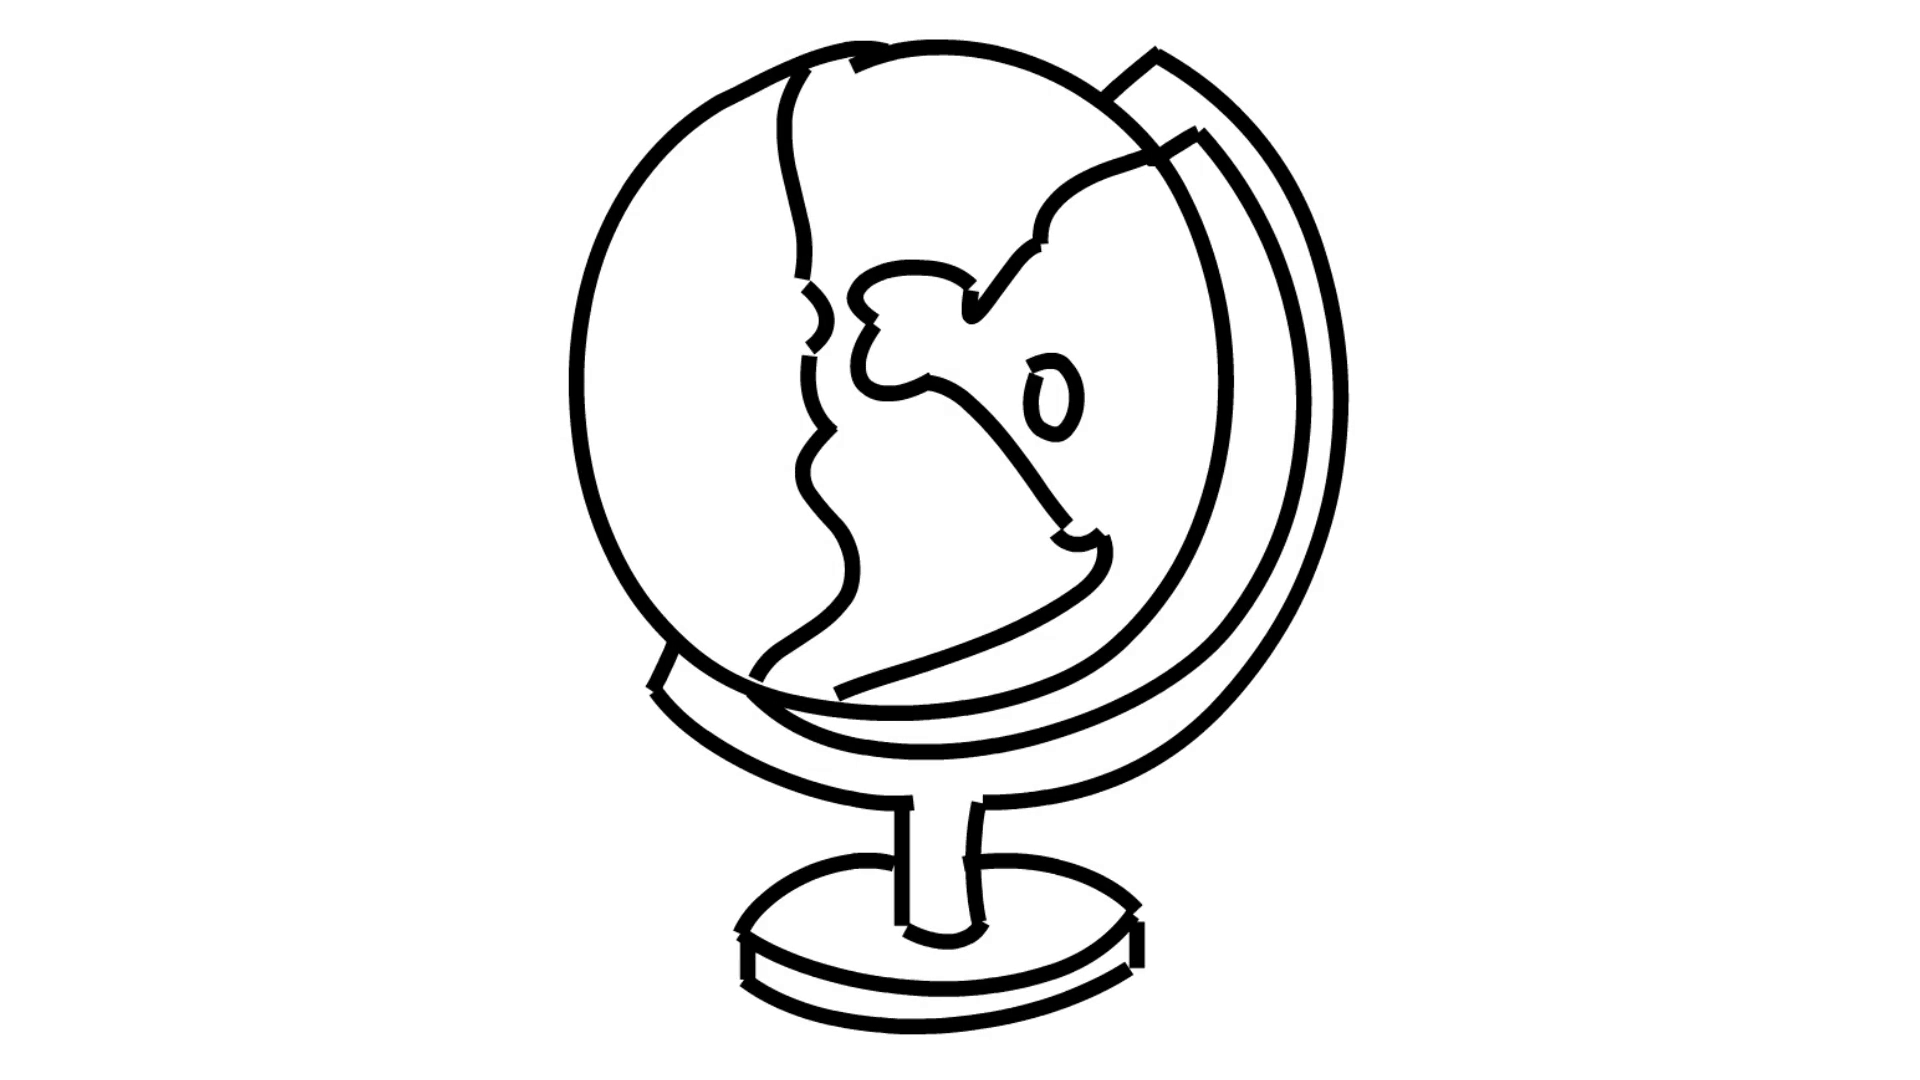 1920x1080 Globe Atlast World Map Line Drawing Illustration Animation